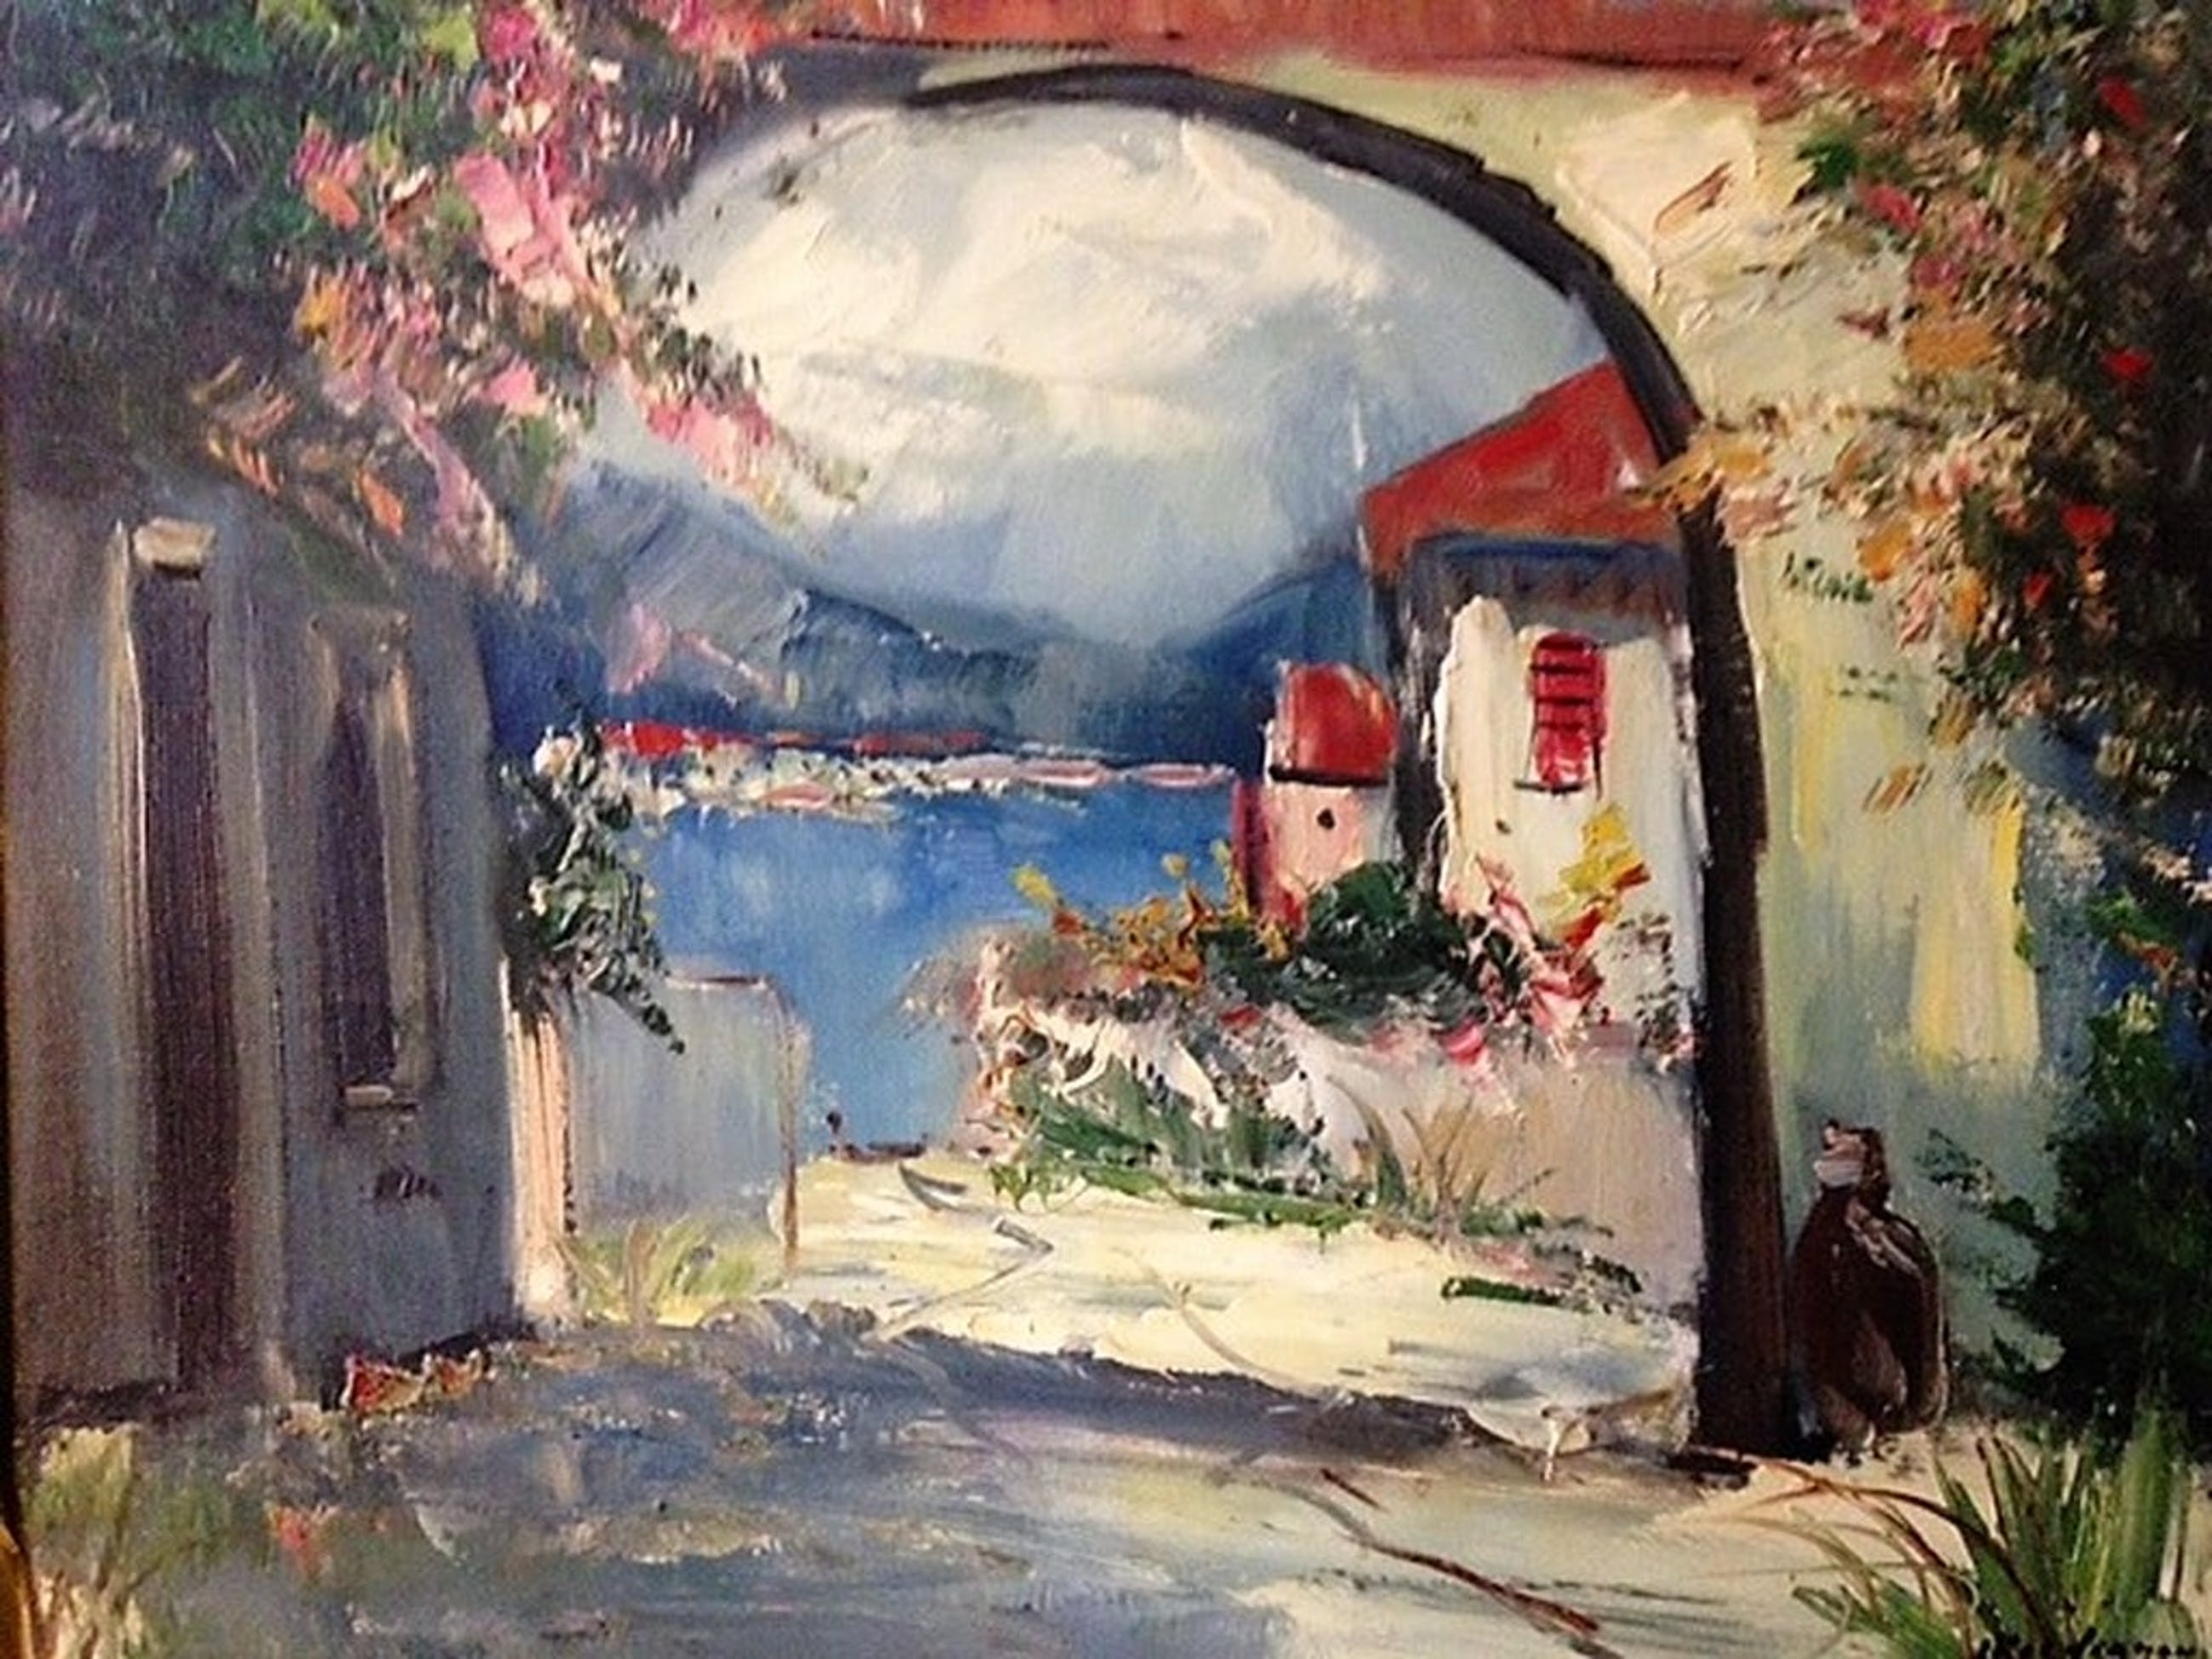 Jan Kelderman (1914-1990), olieverf op doek, Zuid-Frankrijk kopen? Bied vanaf 60!